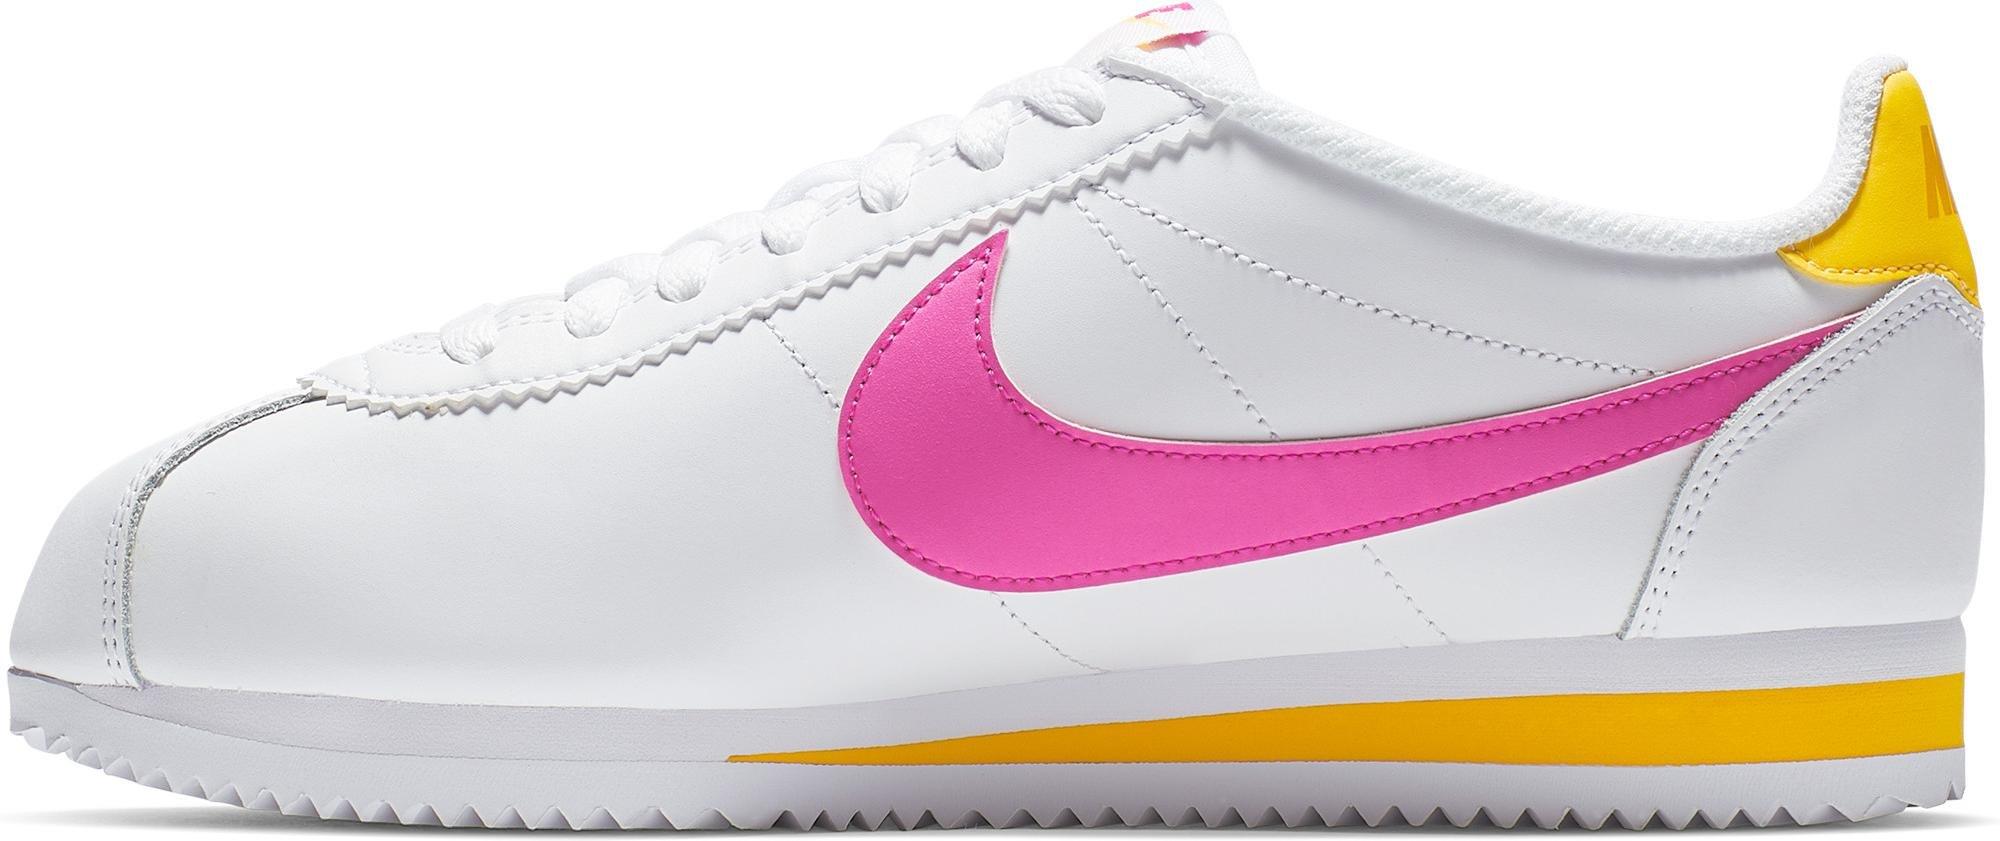 Zapatillas Nike WMNS CLASSIC CORTEZ LEATHER 807471 112 Talla 38 EU | 4,5 UK | 7 US | 24 CM